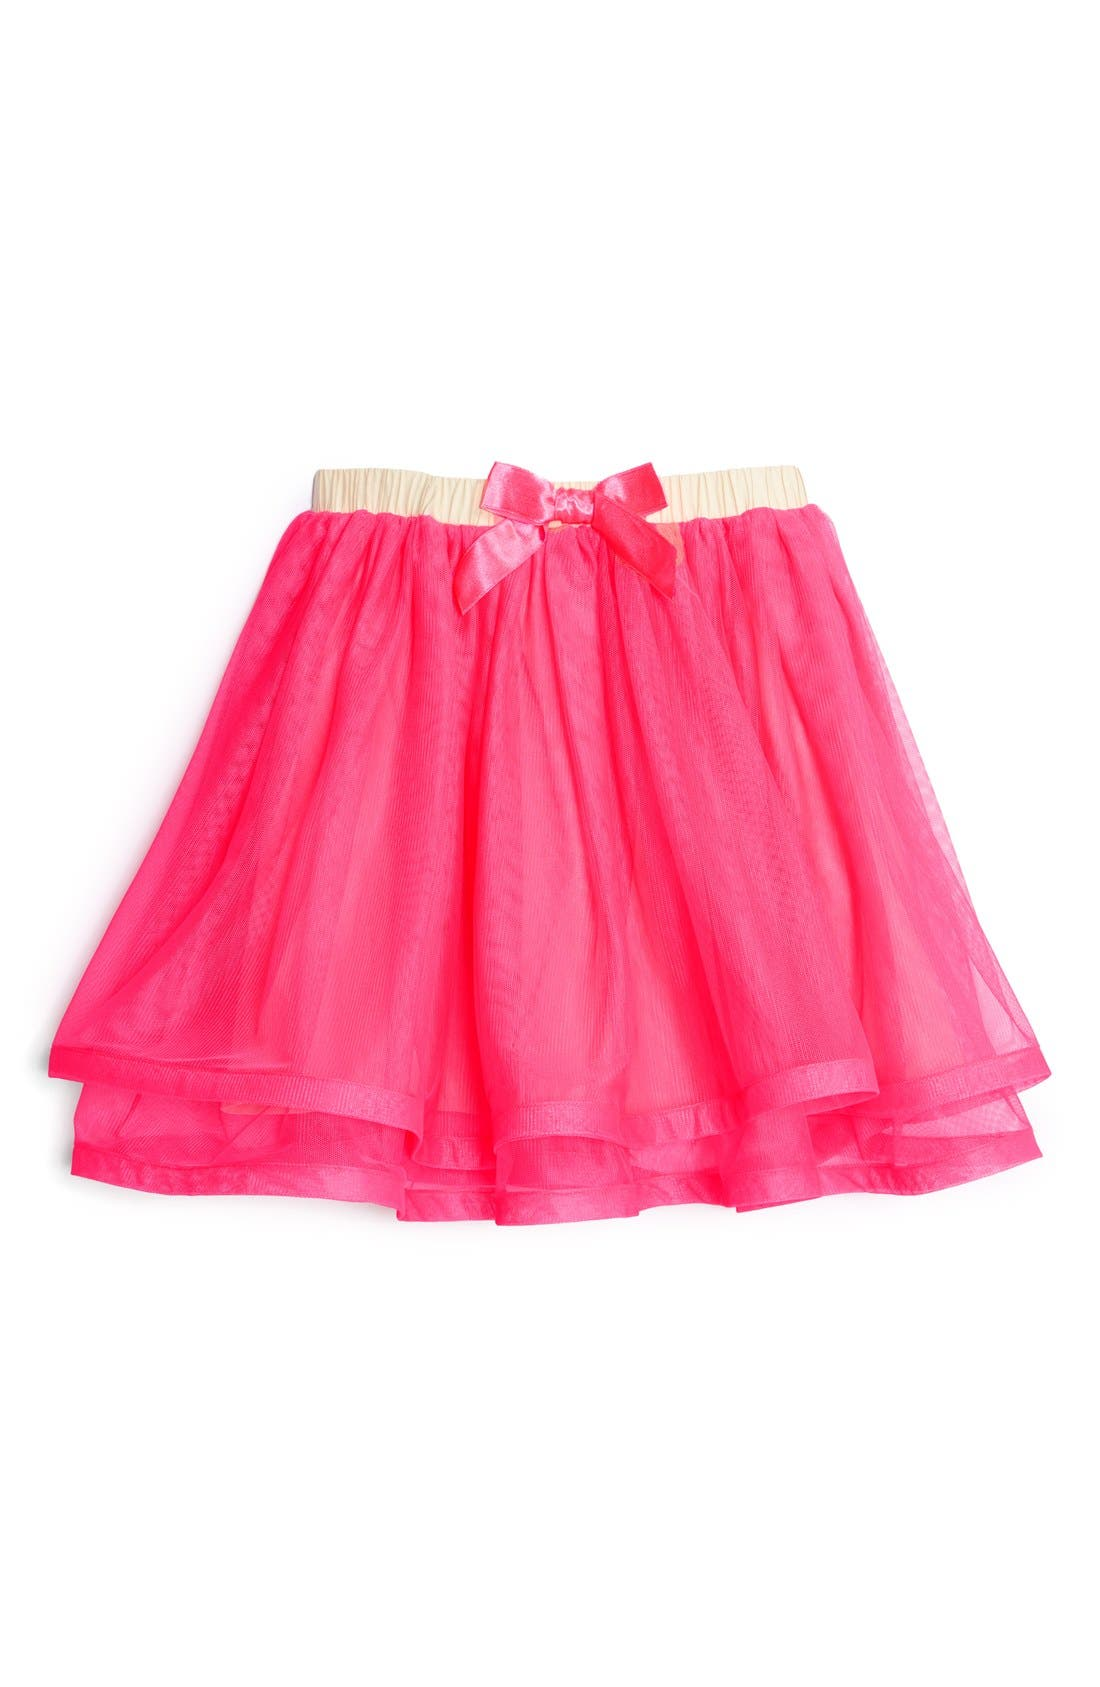 Main Image - Billieblush Tutu Skirt (Toddler Girls, Little Girls & Big Girls)